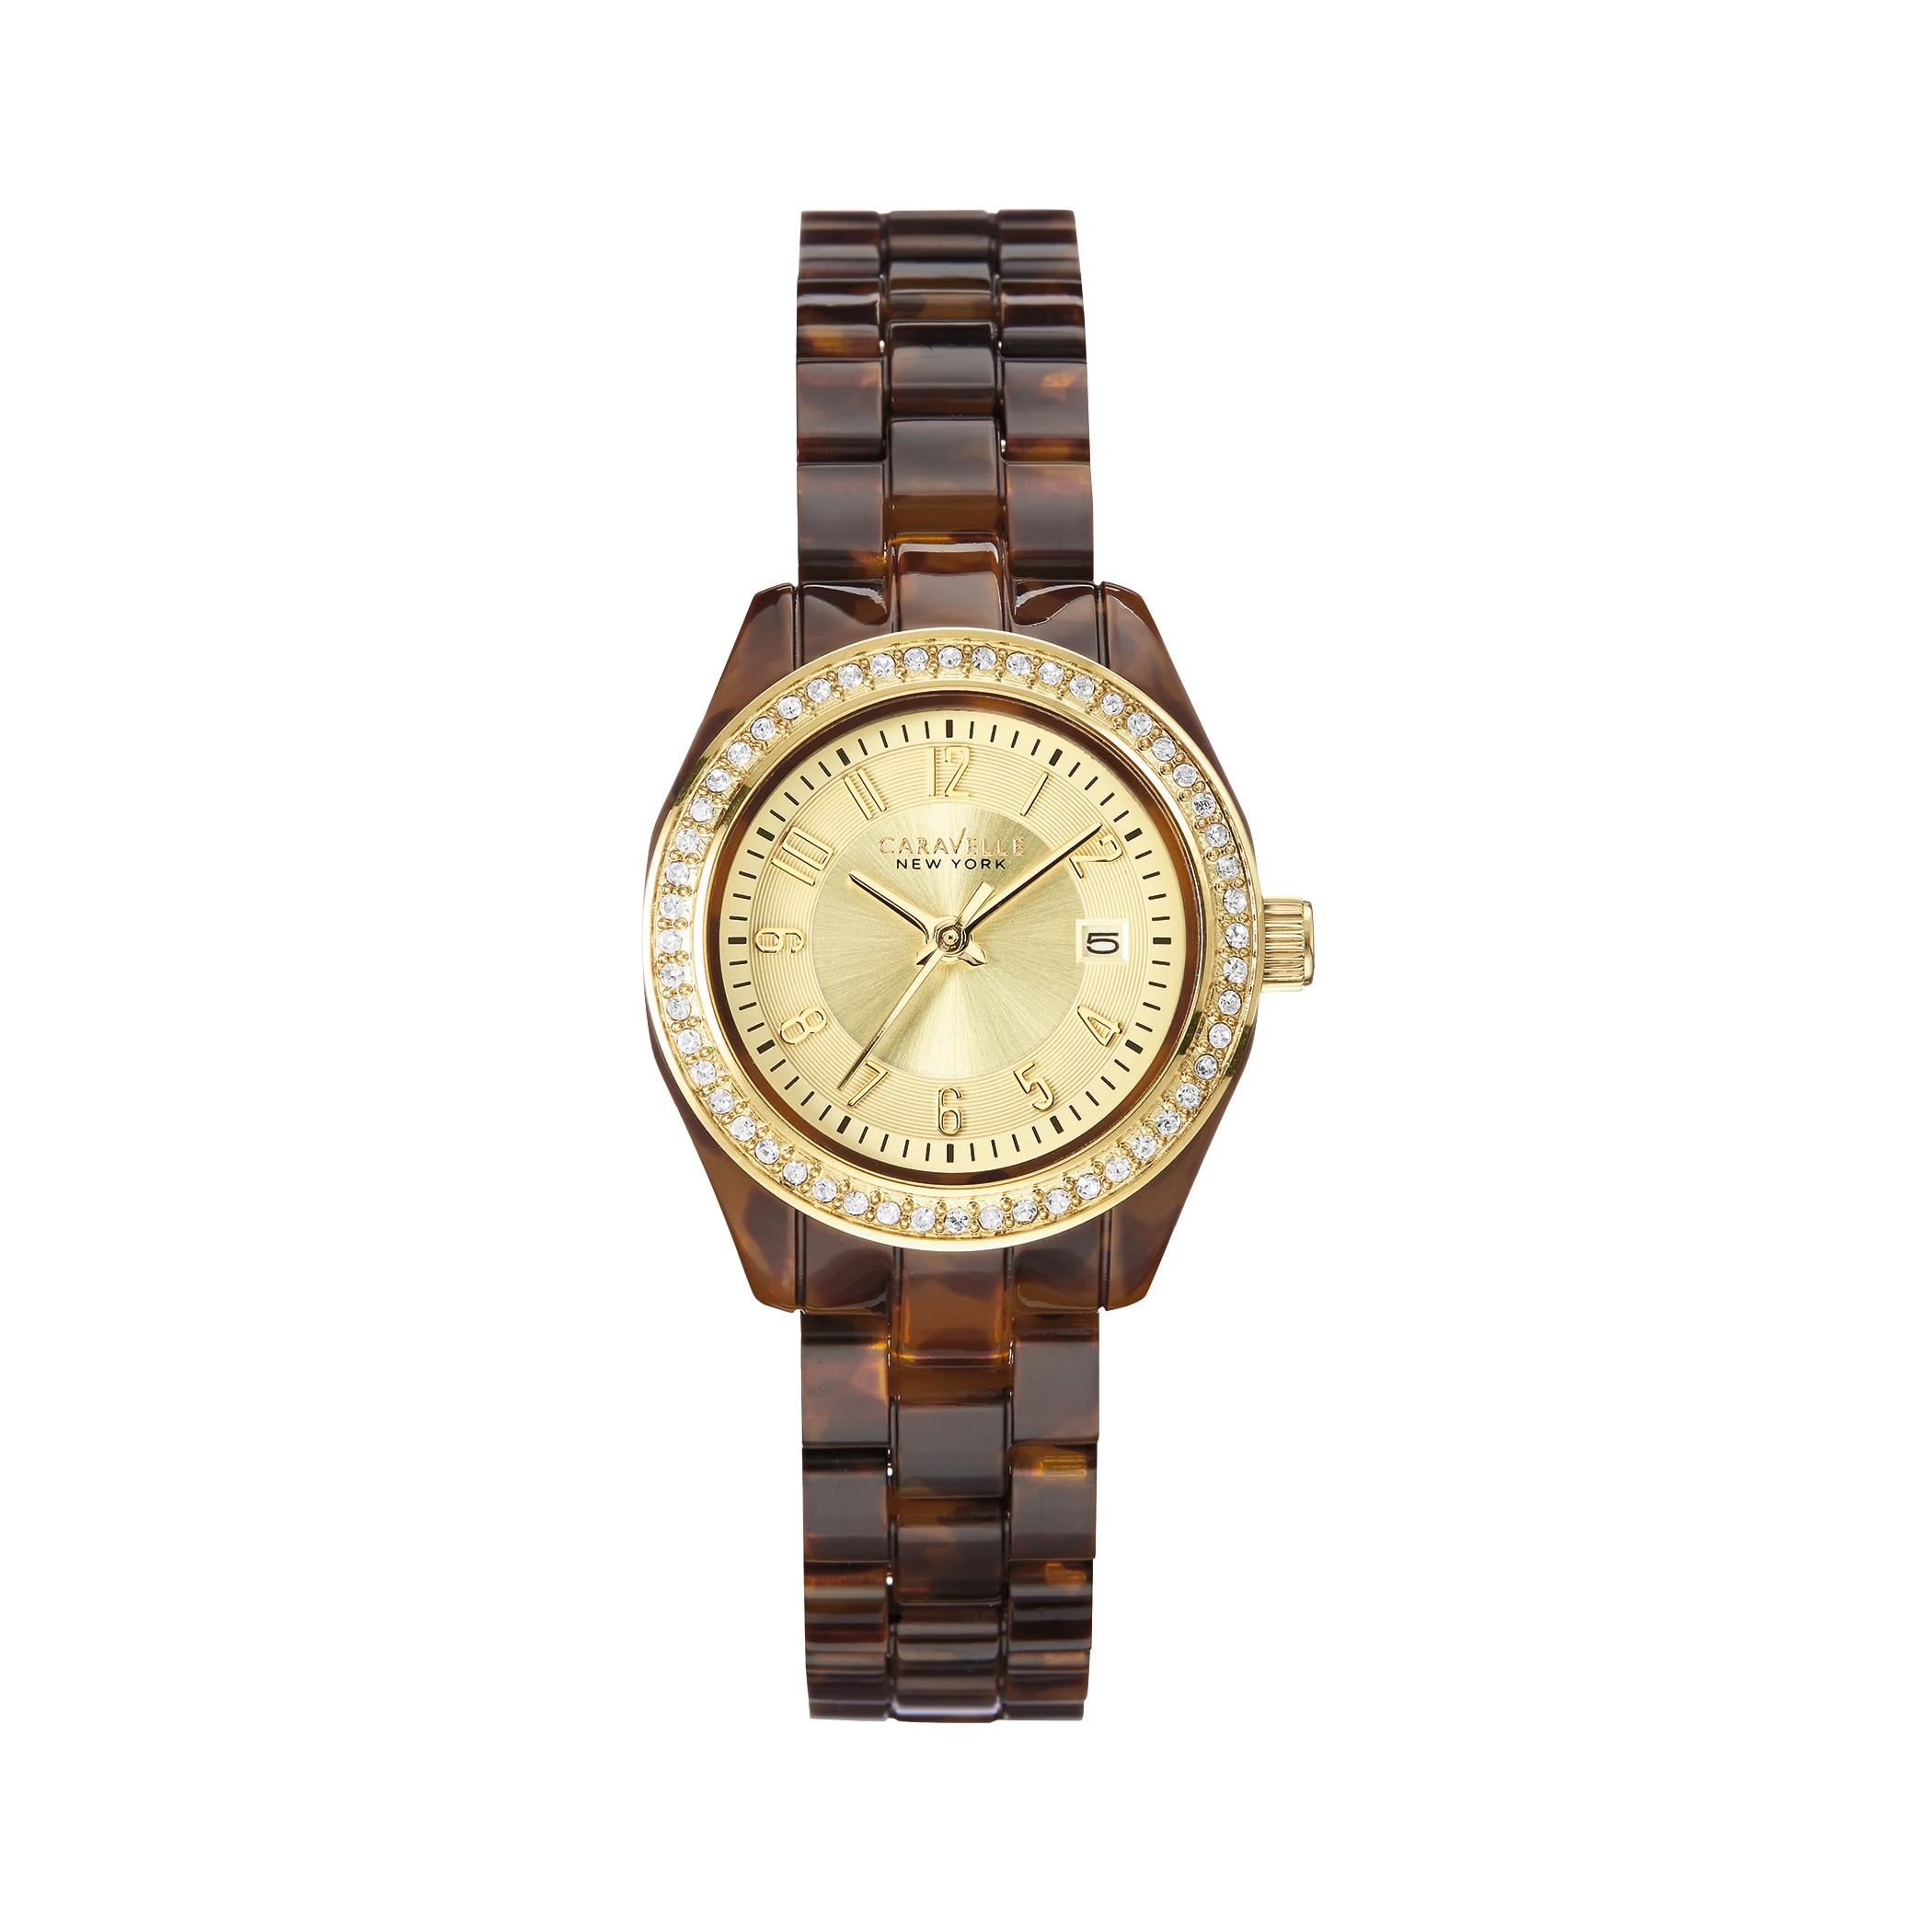 074bede02da8 Shop Caravelle Women s 44M104 Crystal Bezel Tortoise Shell Bracelet Watch -  N A - N A - On Sale - Free Shipping On Orders Over  45 - Overstock -  13445323